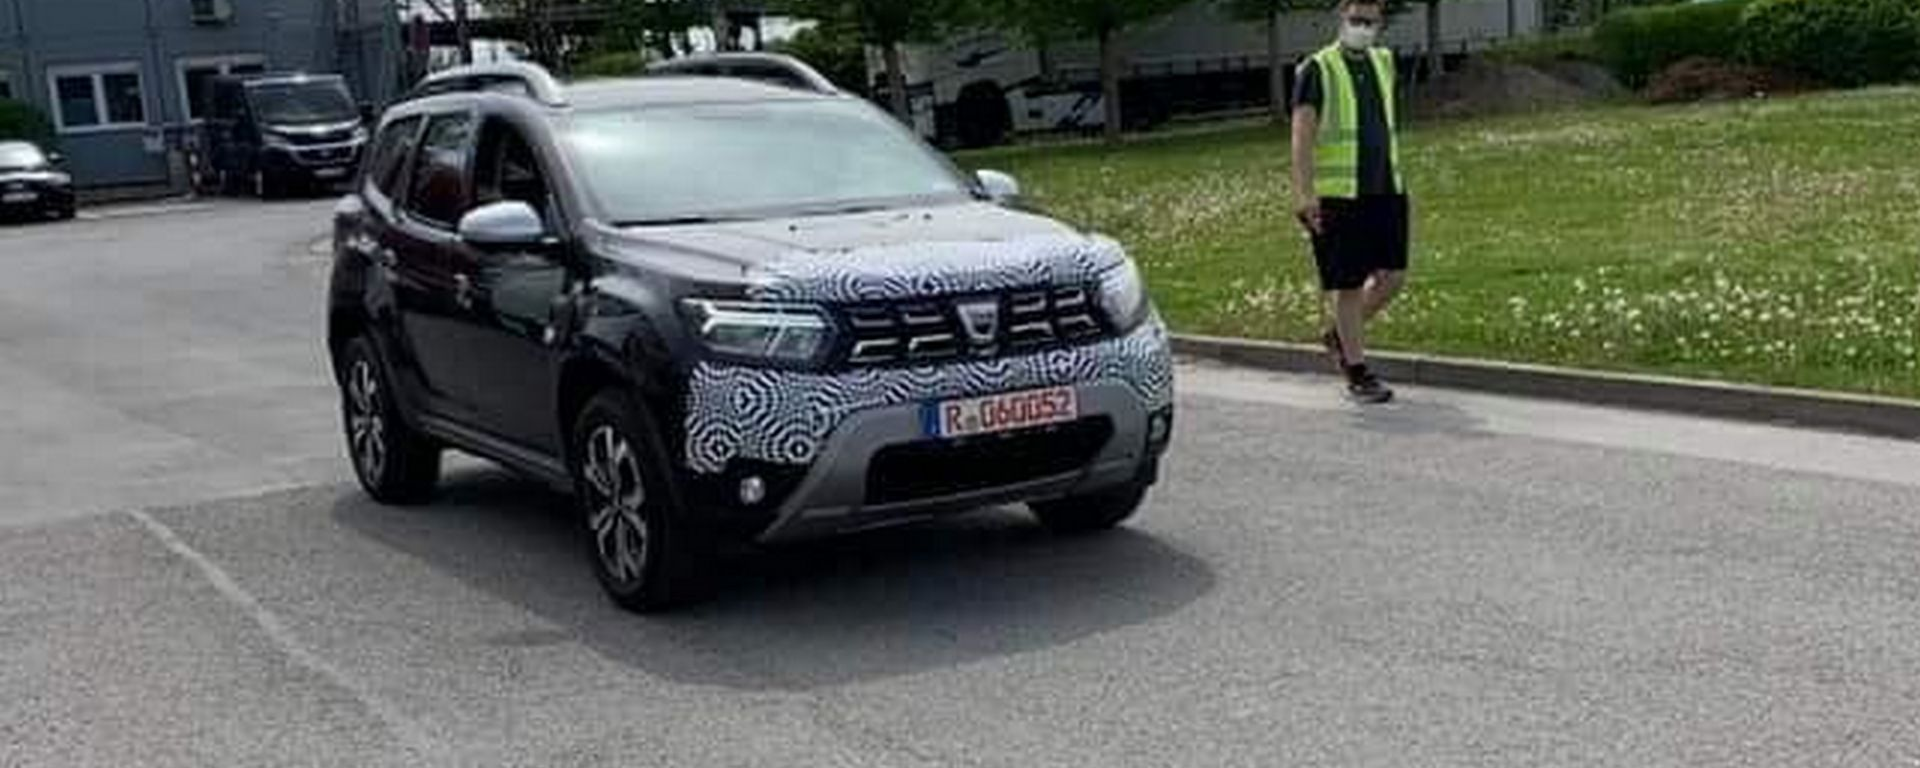 Dacia Duster, restyling in arrivo. Prime foto spia sui social